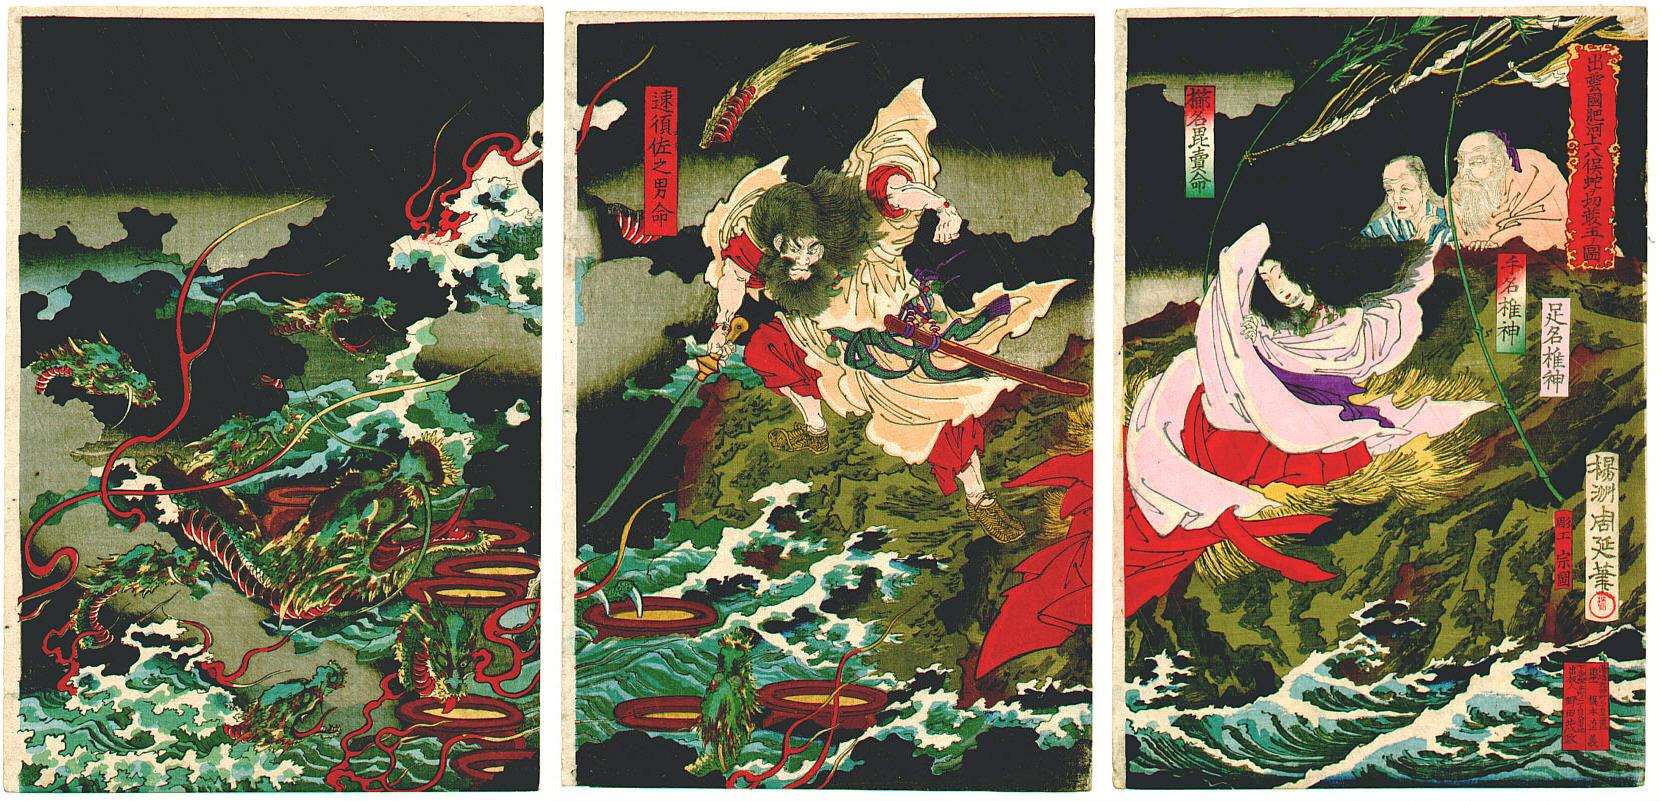 Depiction of Yamata-no-Orochi